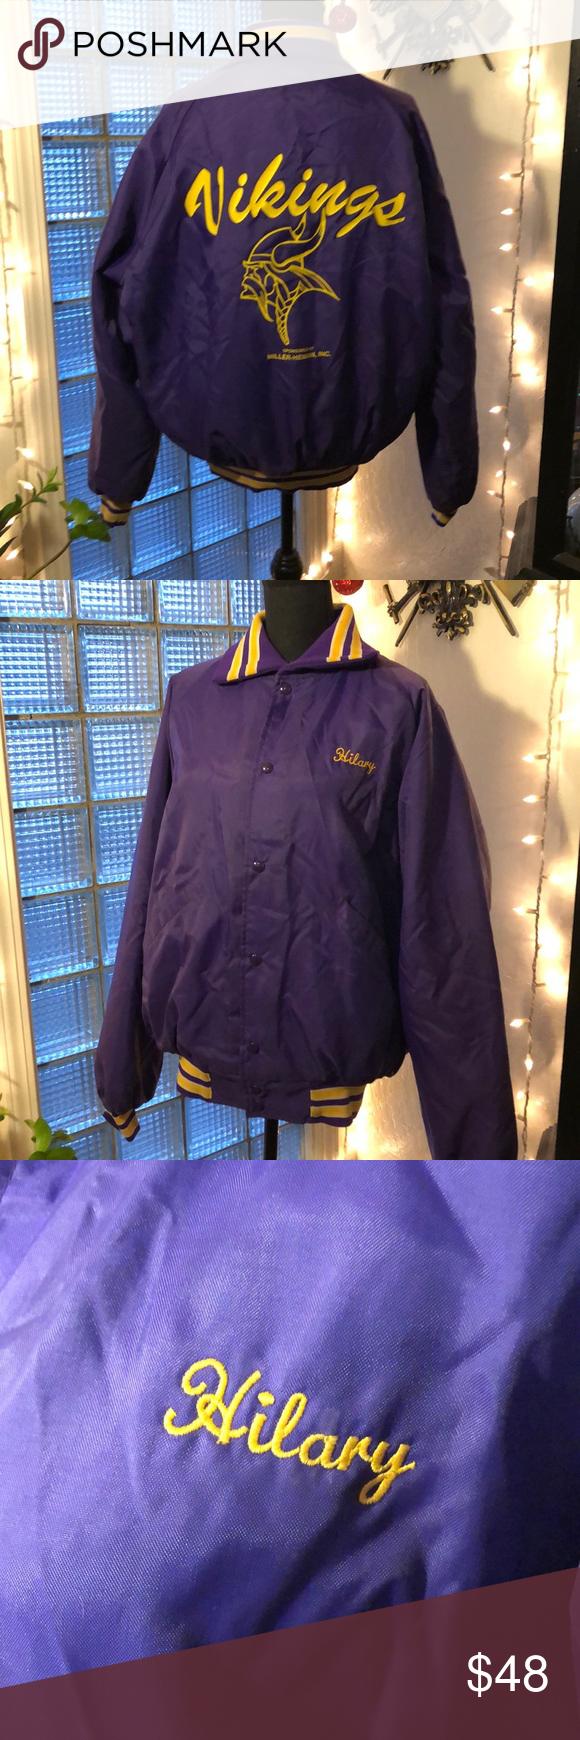 Vintage Minnesota Vikings Jacket Jackets Jackets For Women Clothes Design [ 1740 x 580 Pixel ]